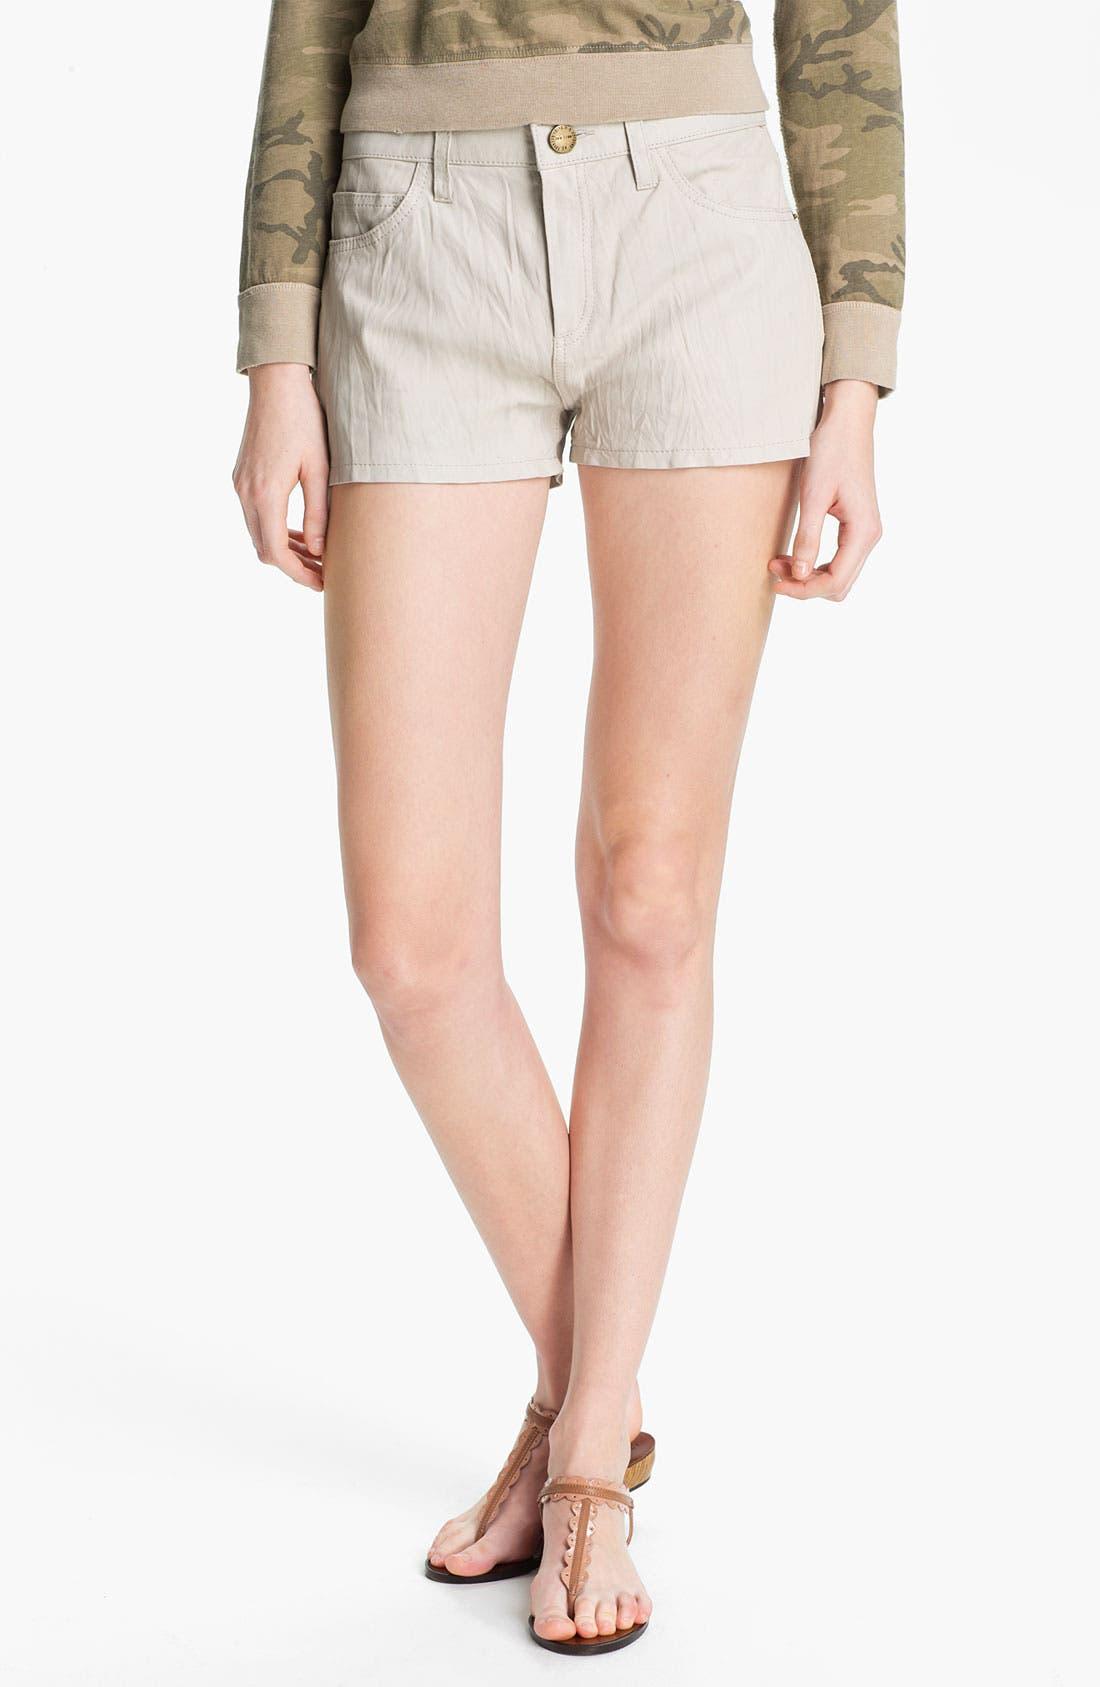 Alternate Image 1 Selected - Current/Elliott 'The Boyfriend' Leather Shorts